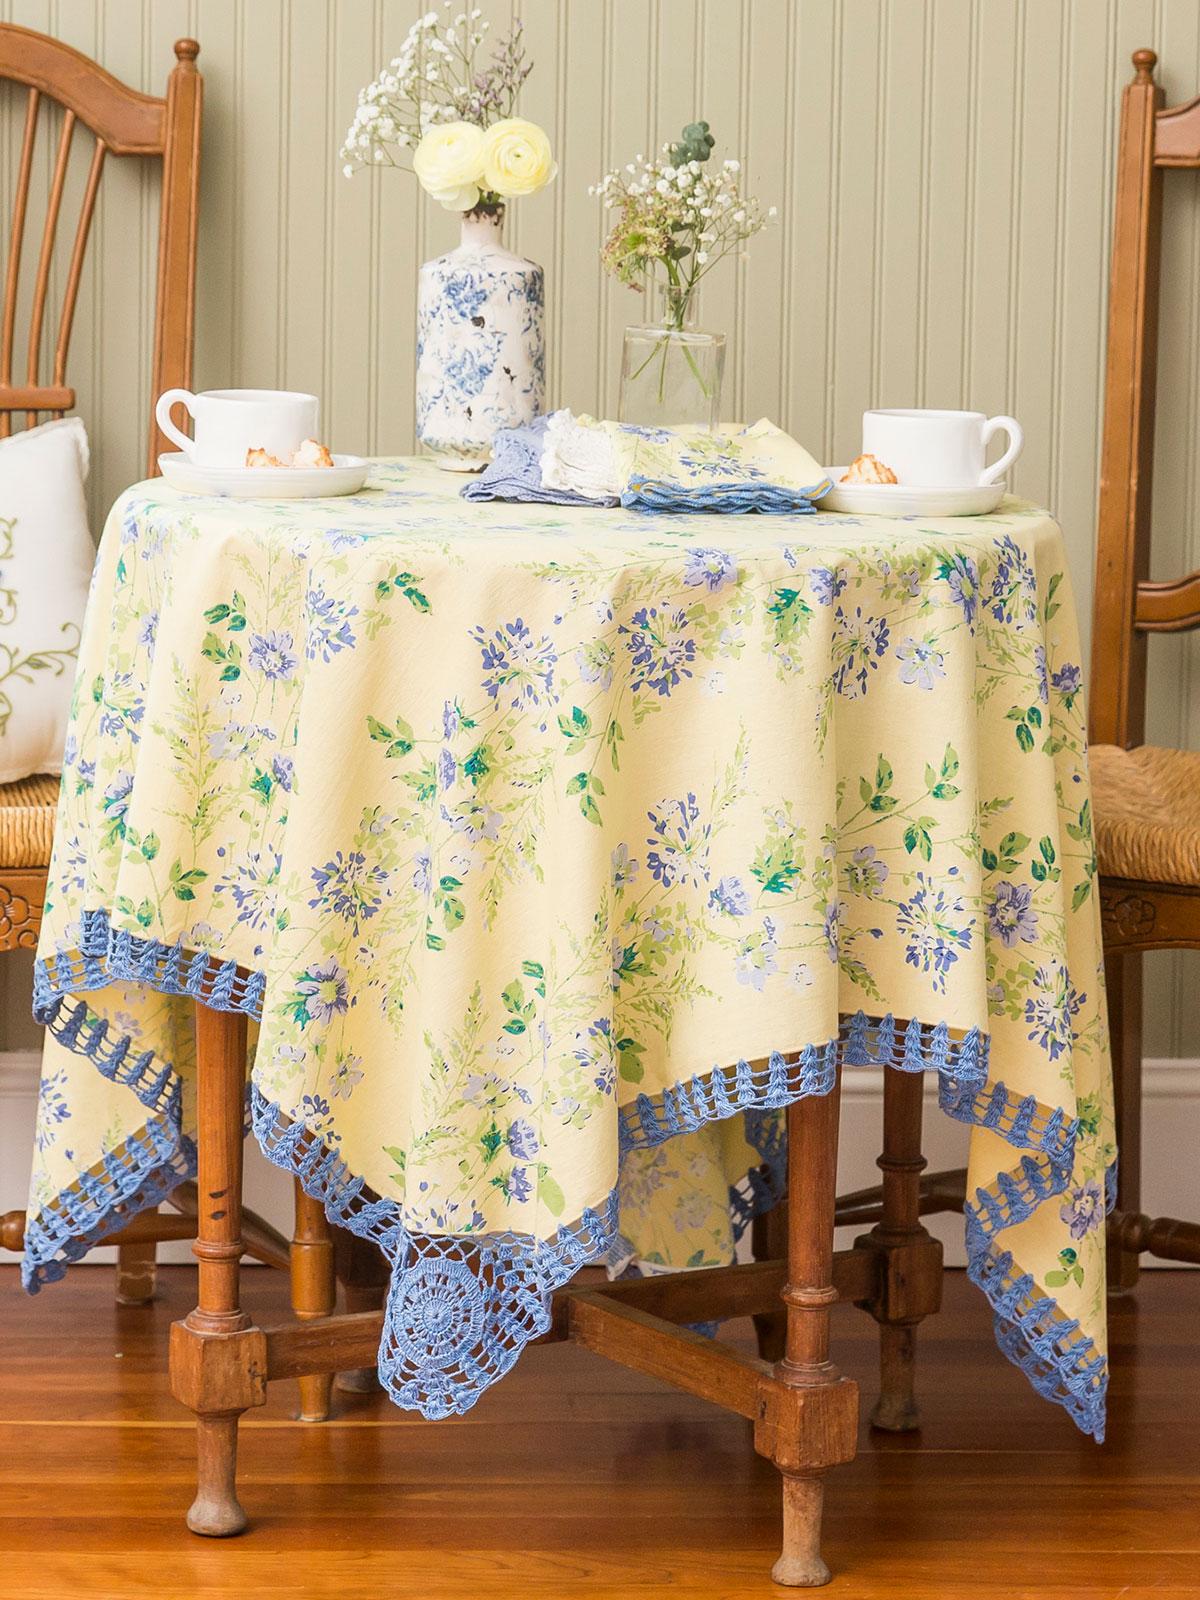 Prairie Crochet Tablecloth  Linens  Kitchen Tablecloths